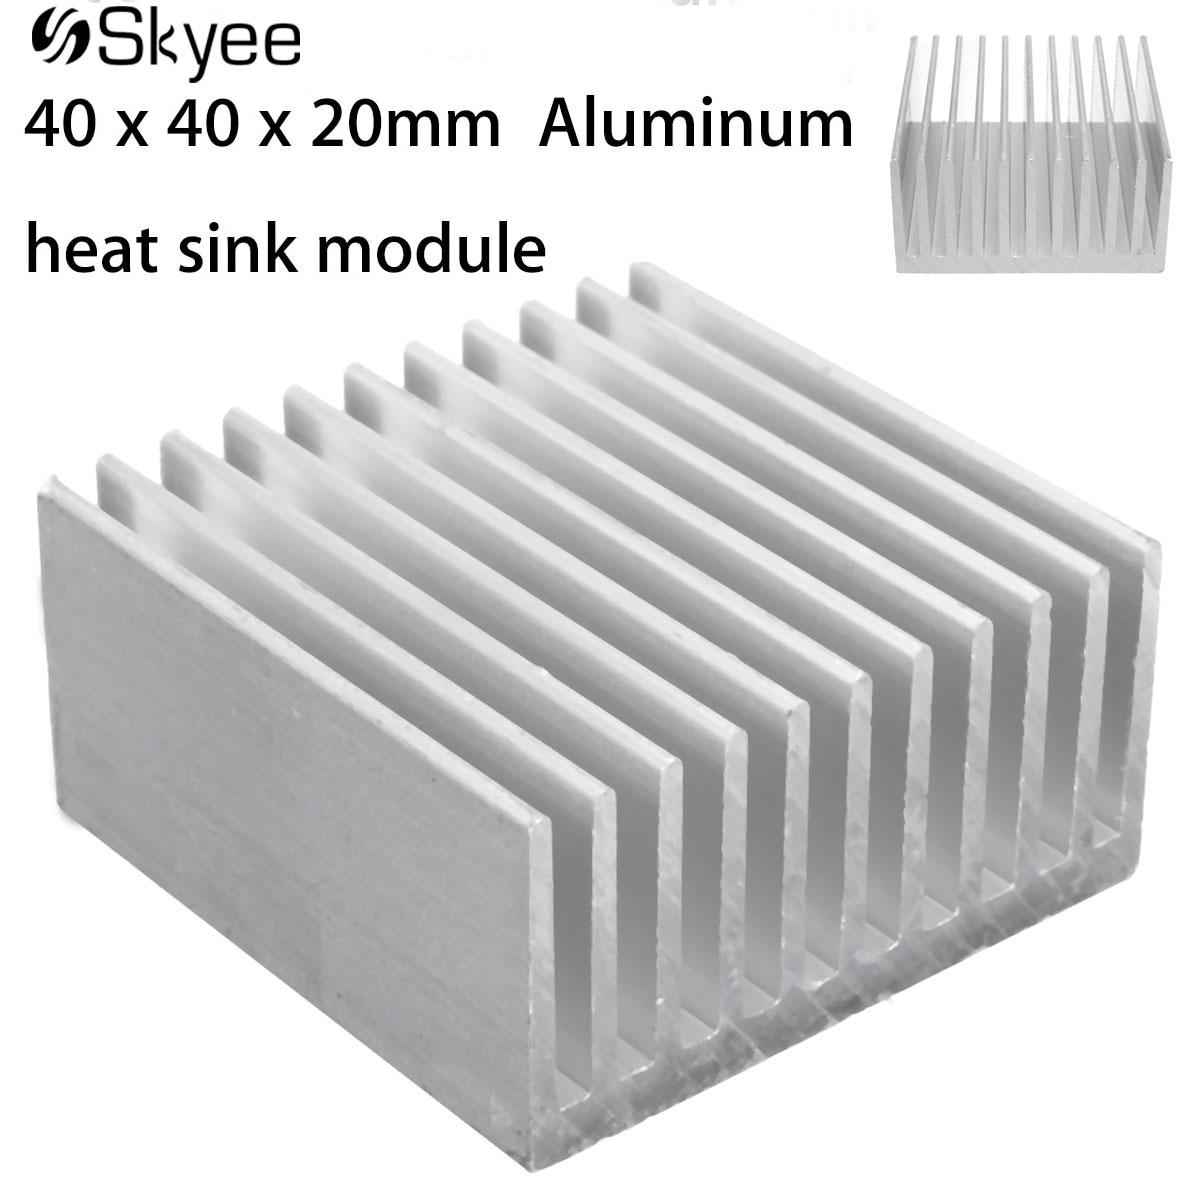 100pcs Lot 28mm 28x28x11mm Aluminum Memory IC Chip Cooling HeatSink With 3M Tape